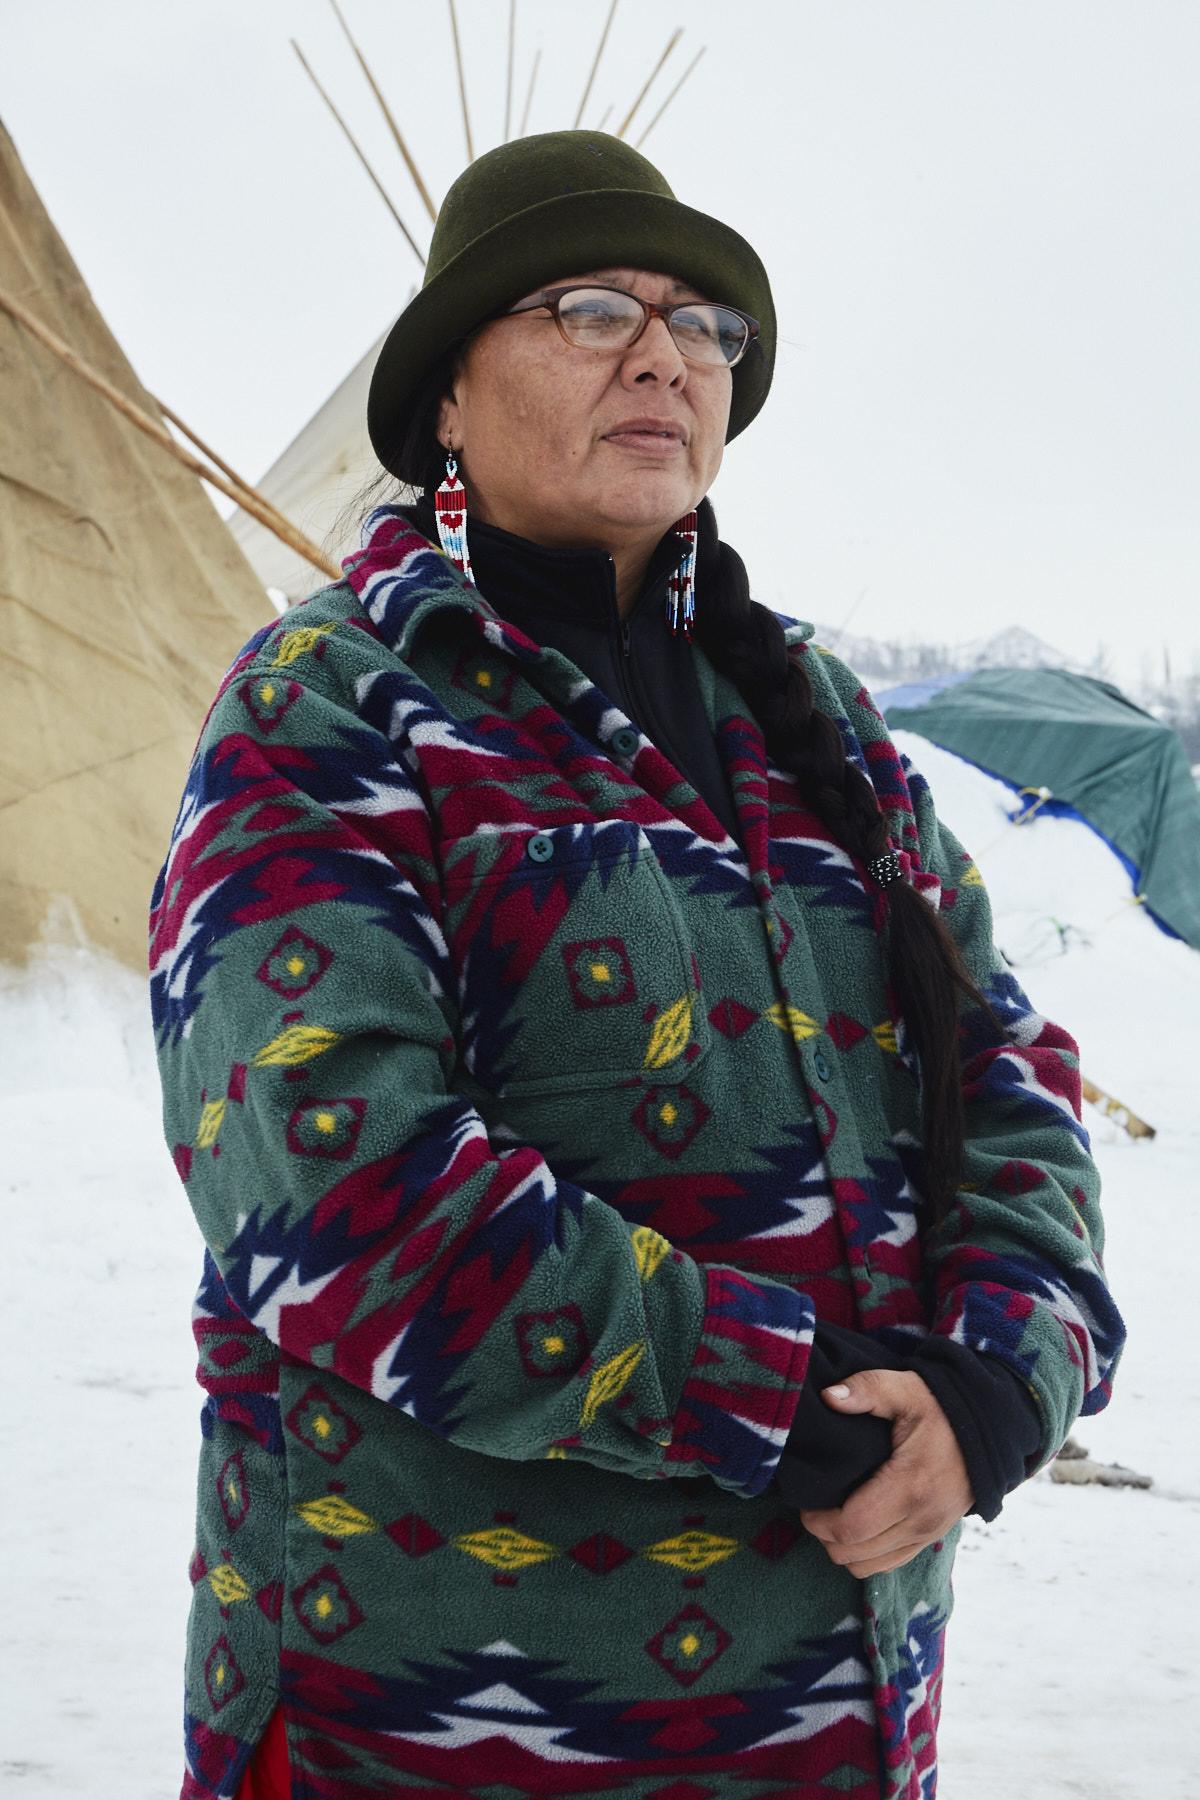 Melaine Stoneman, from the Sicangu Lakota (Burnt Thigh Nation) tribe in Pine Ridge Reservation, South Dakota